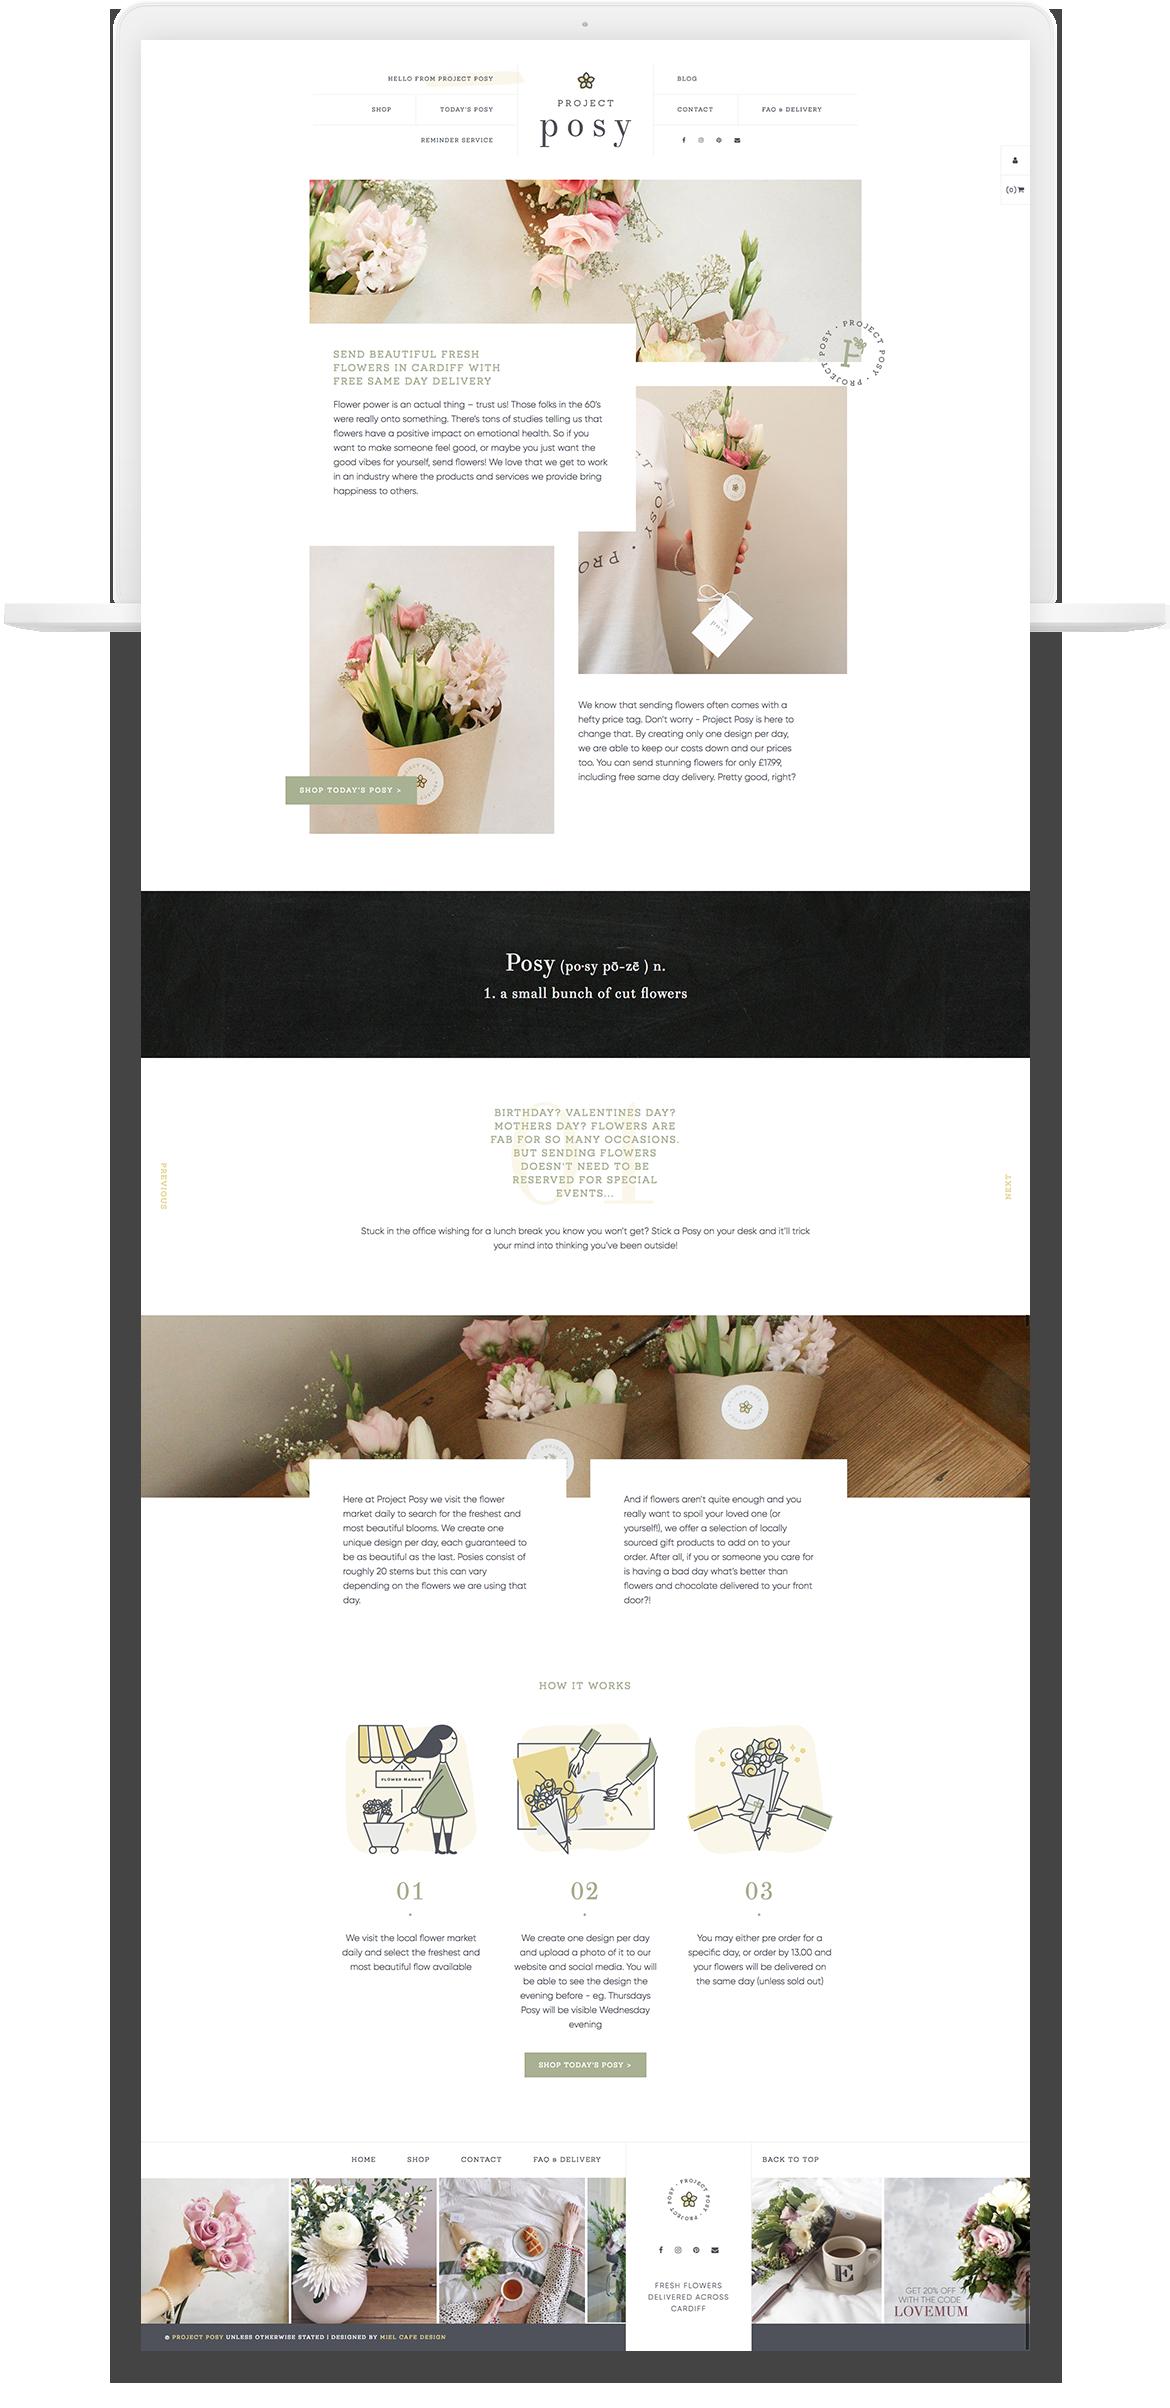 Miel Café Design Portfolio: Website for Project Posy flower delivery service